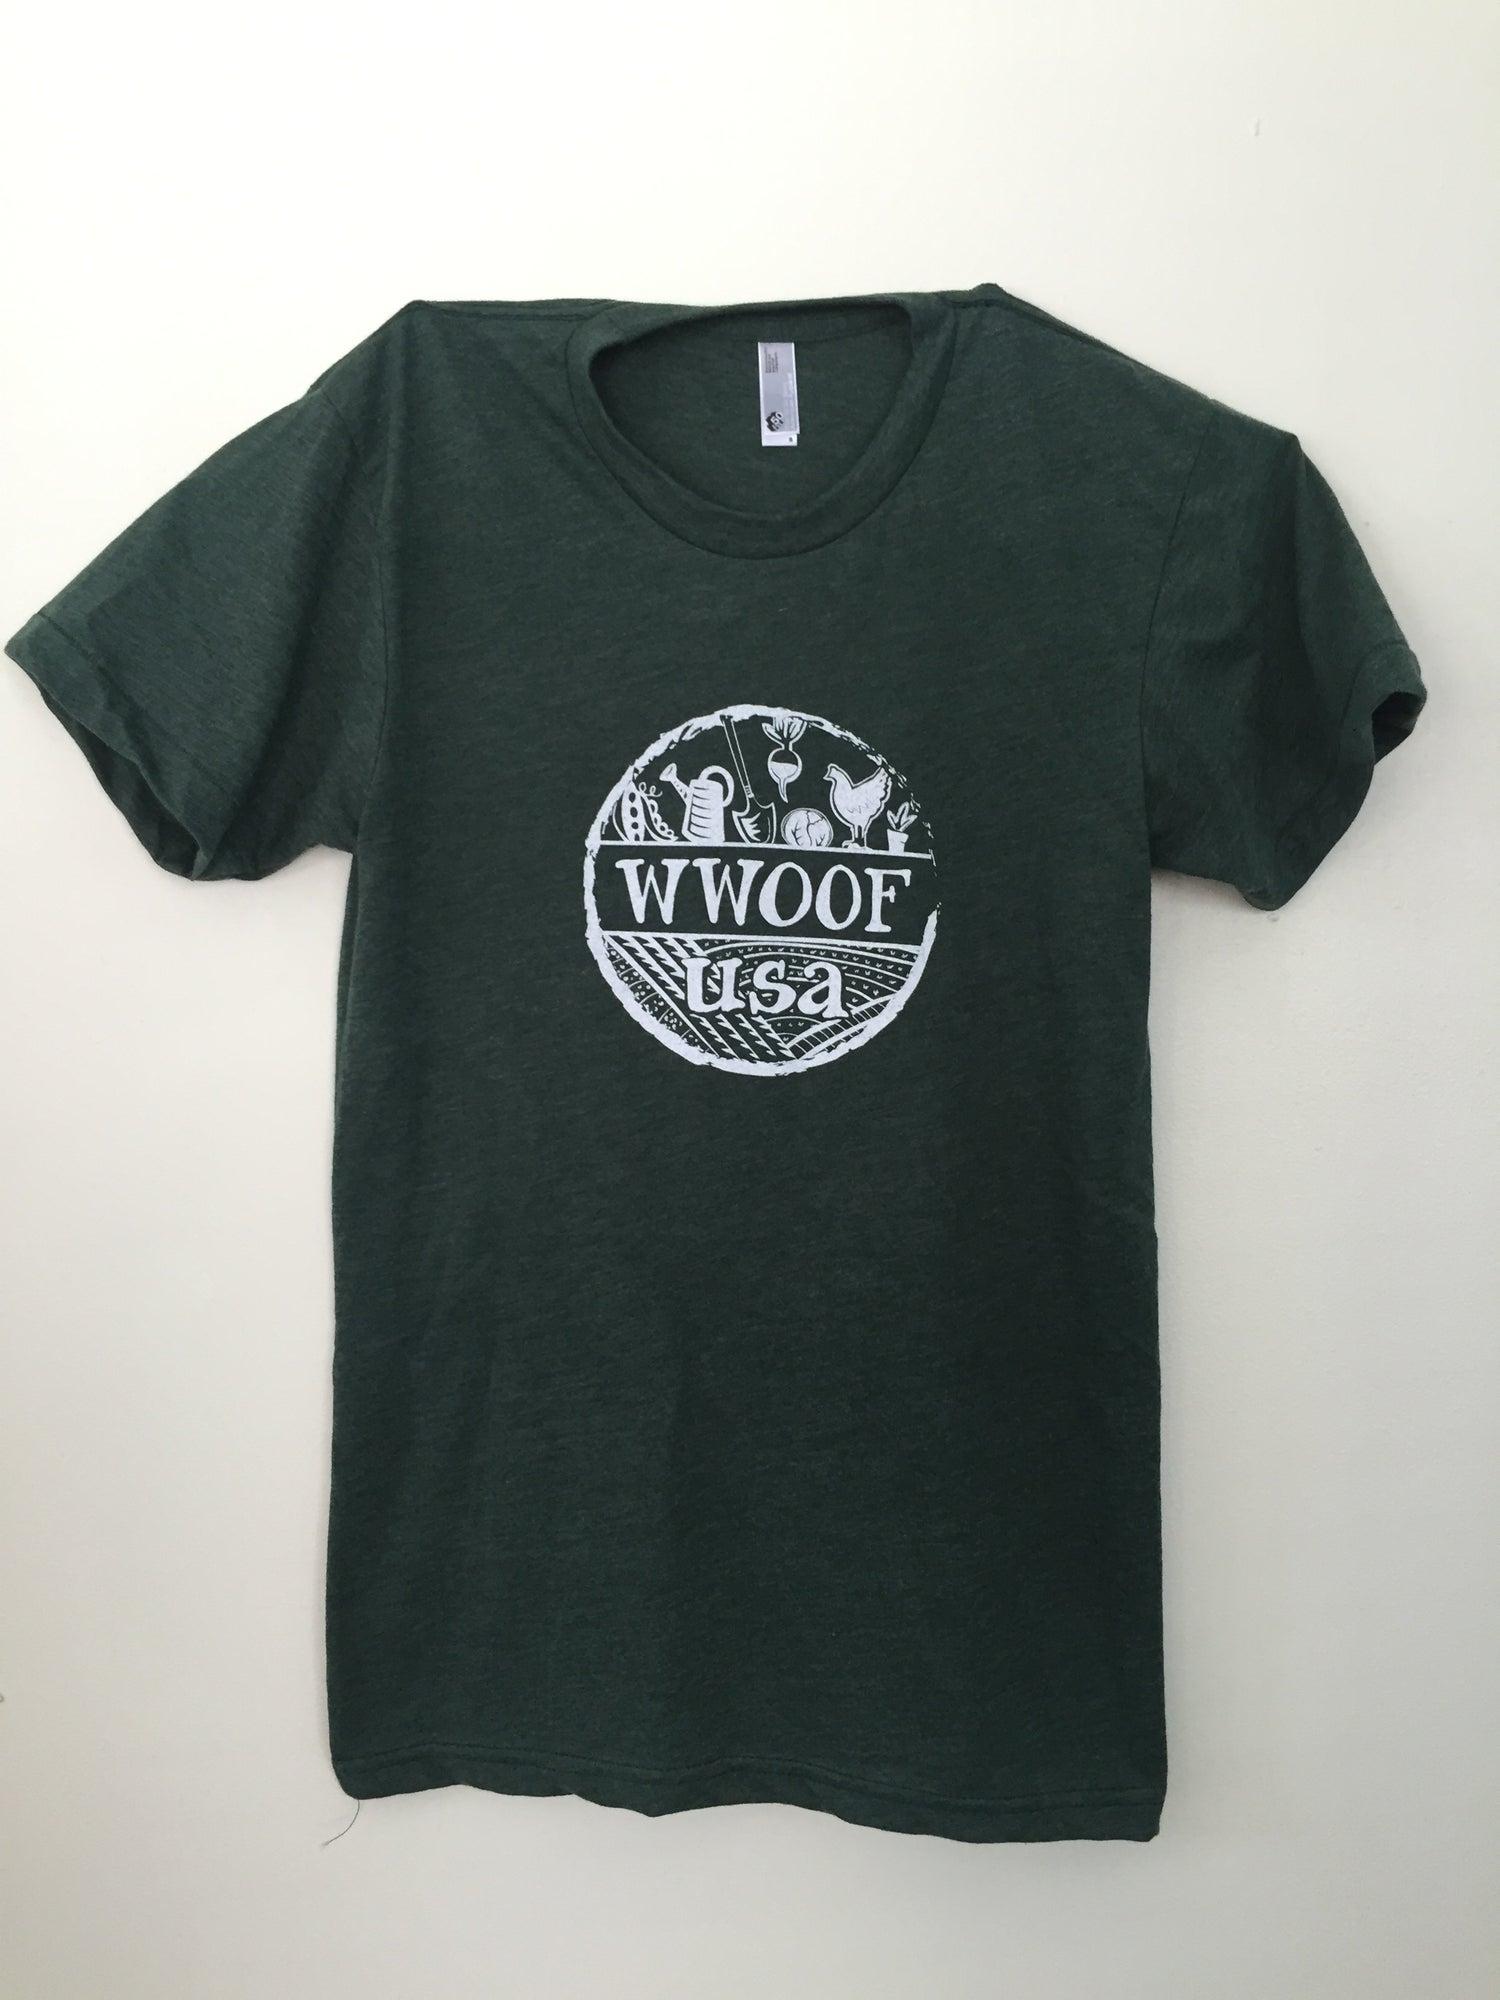 Image of WWOOF-USA Women's T-shirt